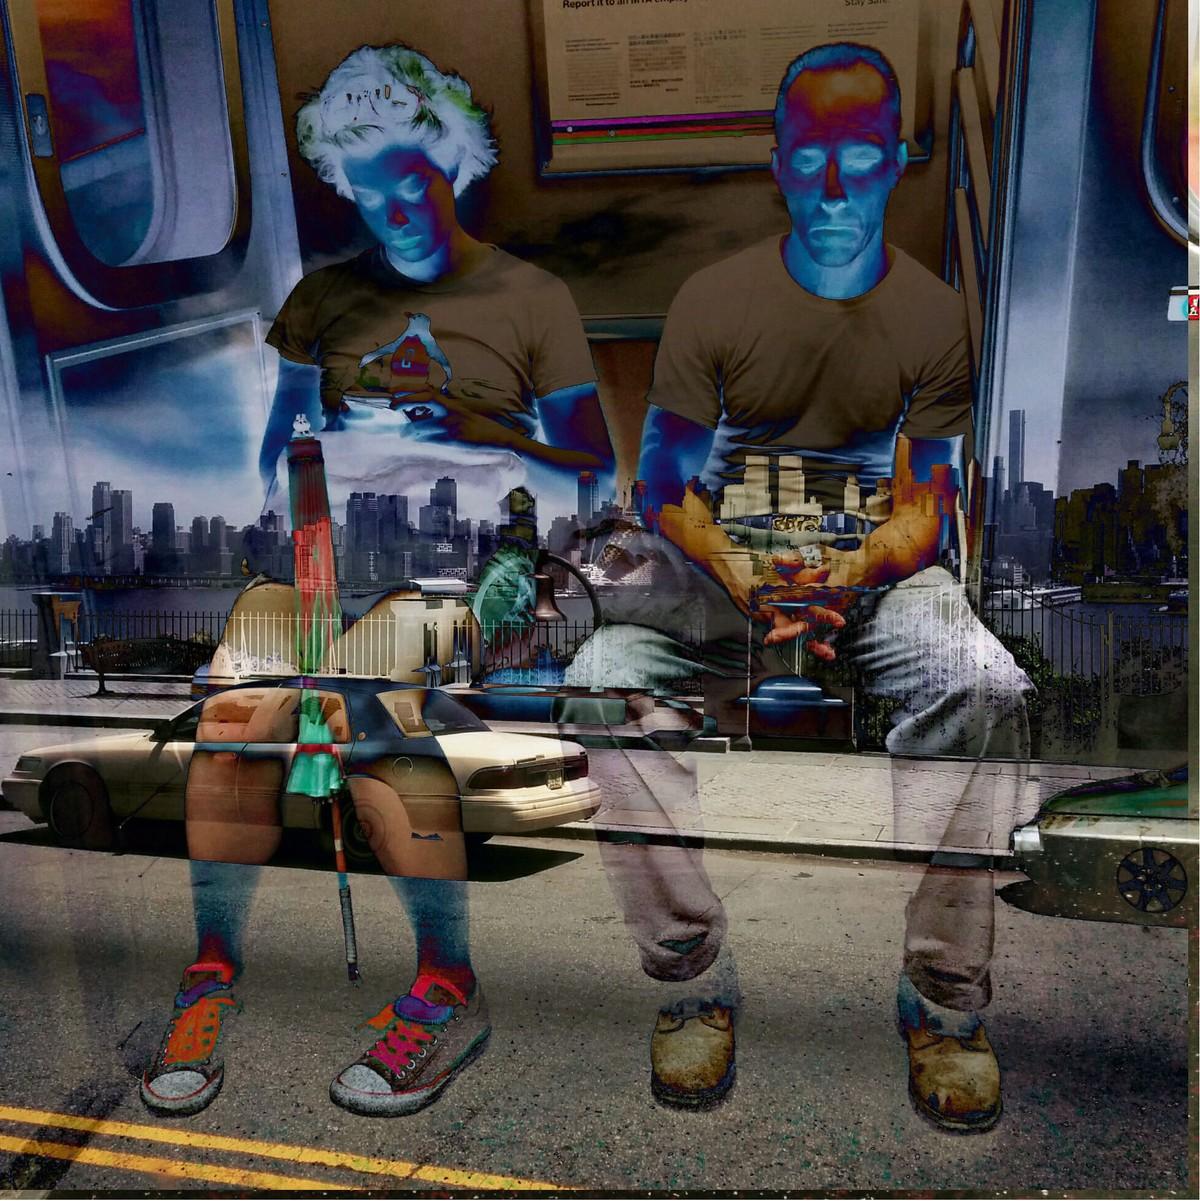 New York City by Prapti Mittal, Digital Digital Art, Digital Print on Canvas, Blue color